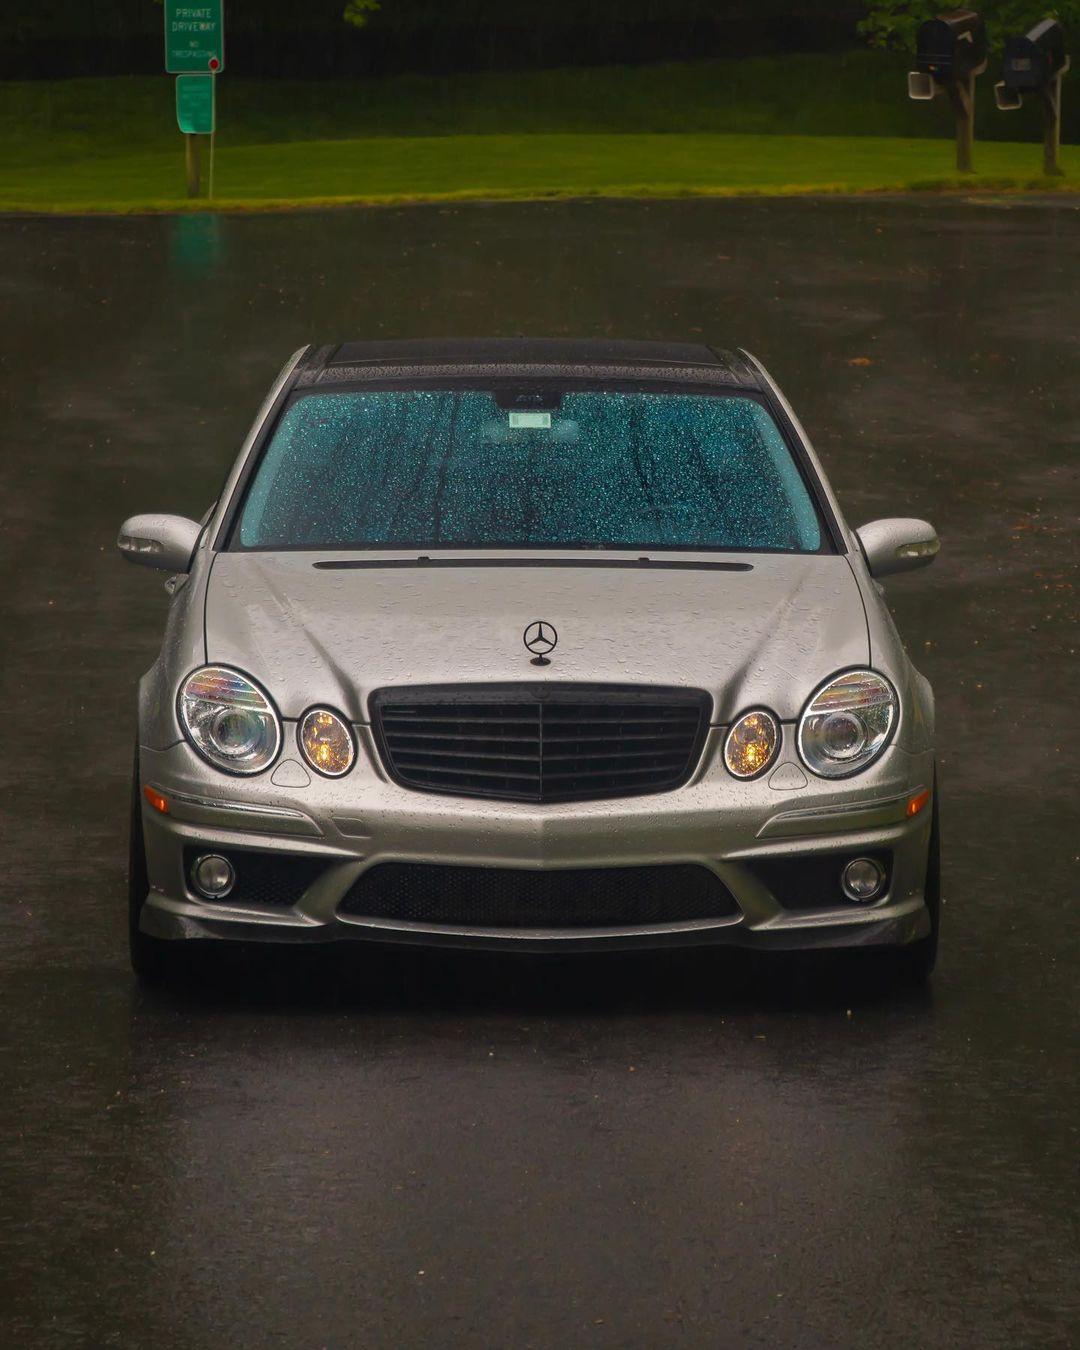 Mercedes-ClasseEW211-Fiche-occasion-1.jpg